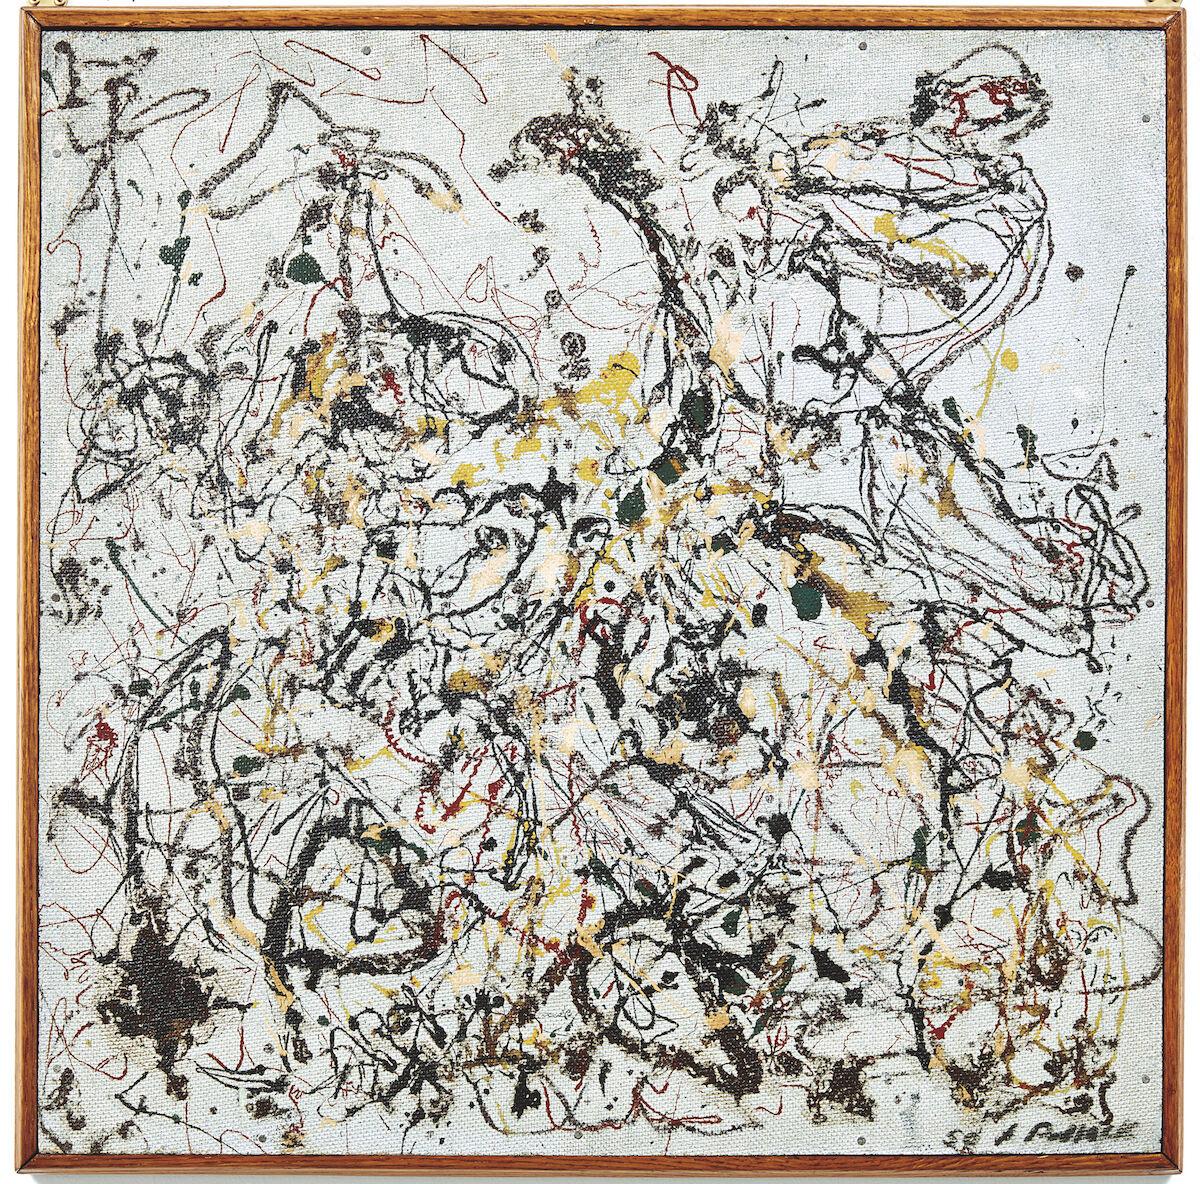 Jackson Pollock, Number 16, 1950, oil on masonite. Image courtesy Phillips.